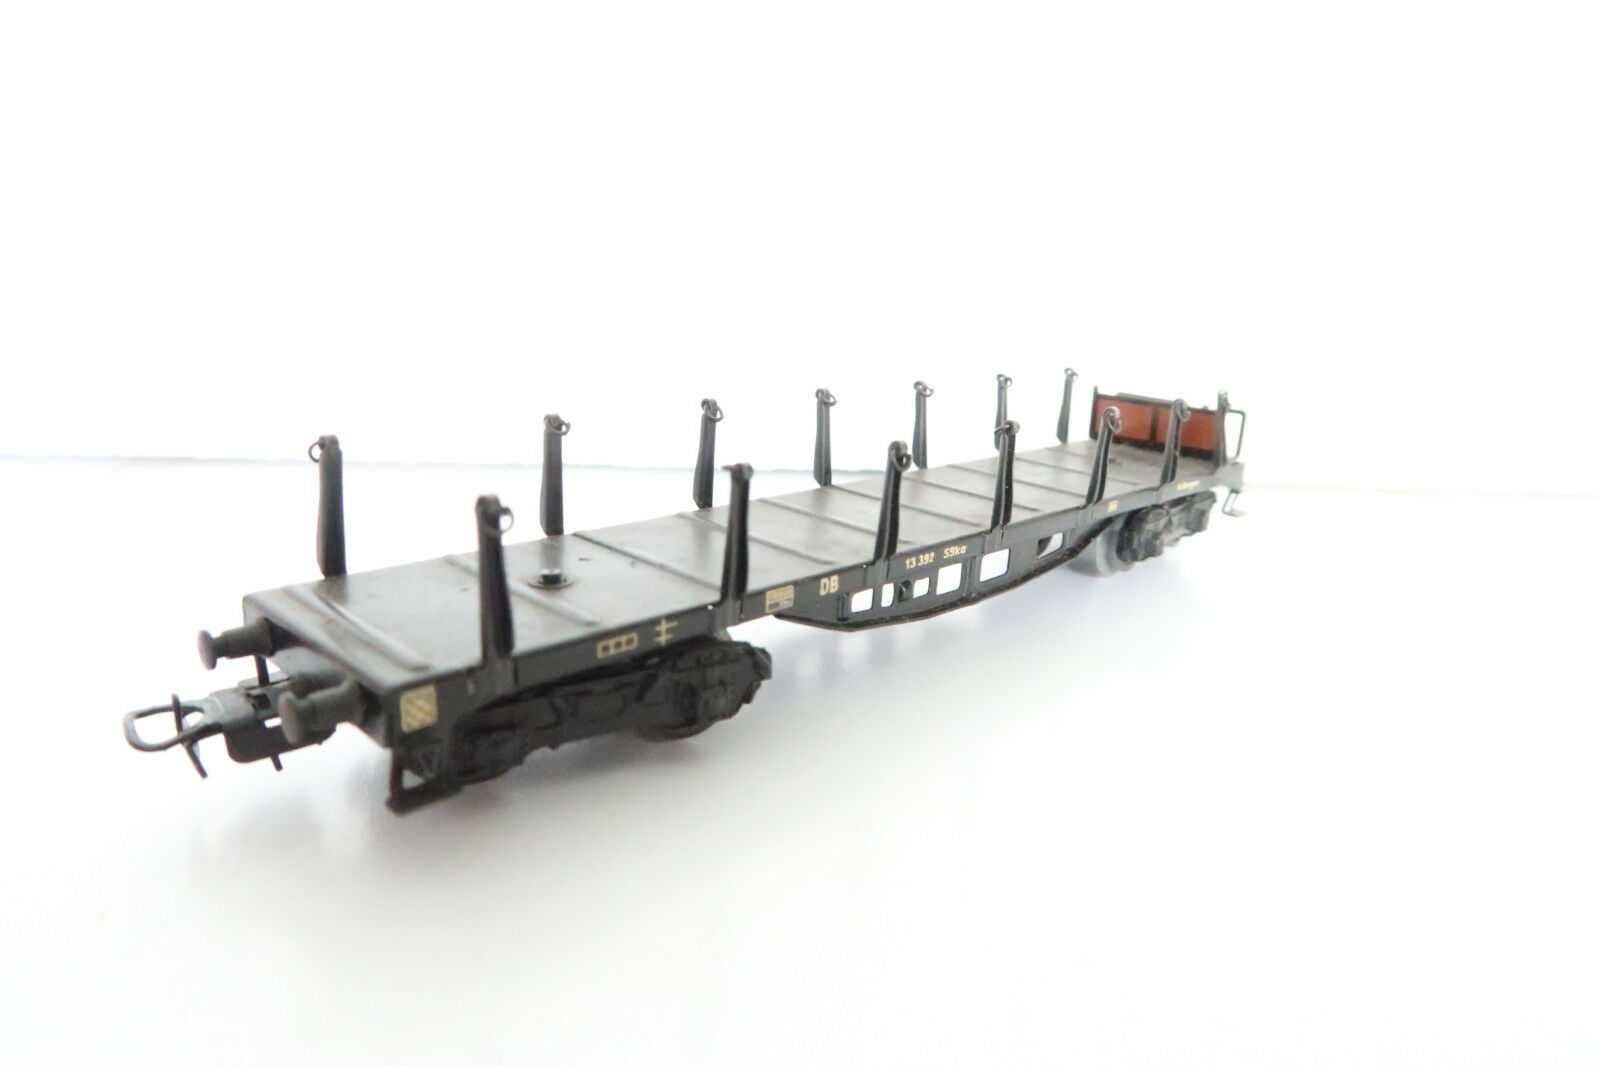 Märklin HO AC Rungenwagen 13 392 DB DB DB  (DH 93-15R1 6 2)  | Sale Online Shop  a99e7b